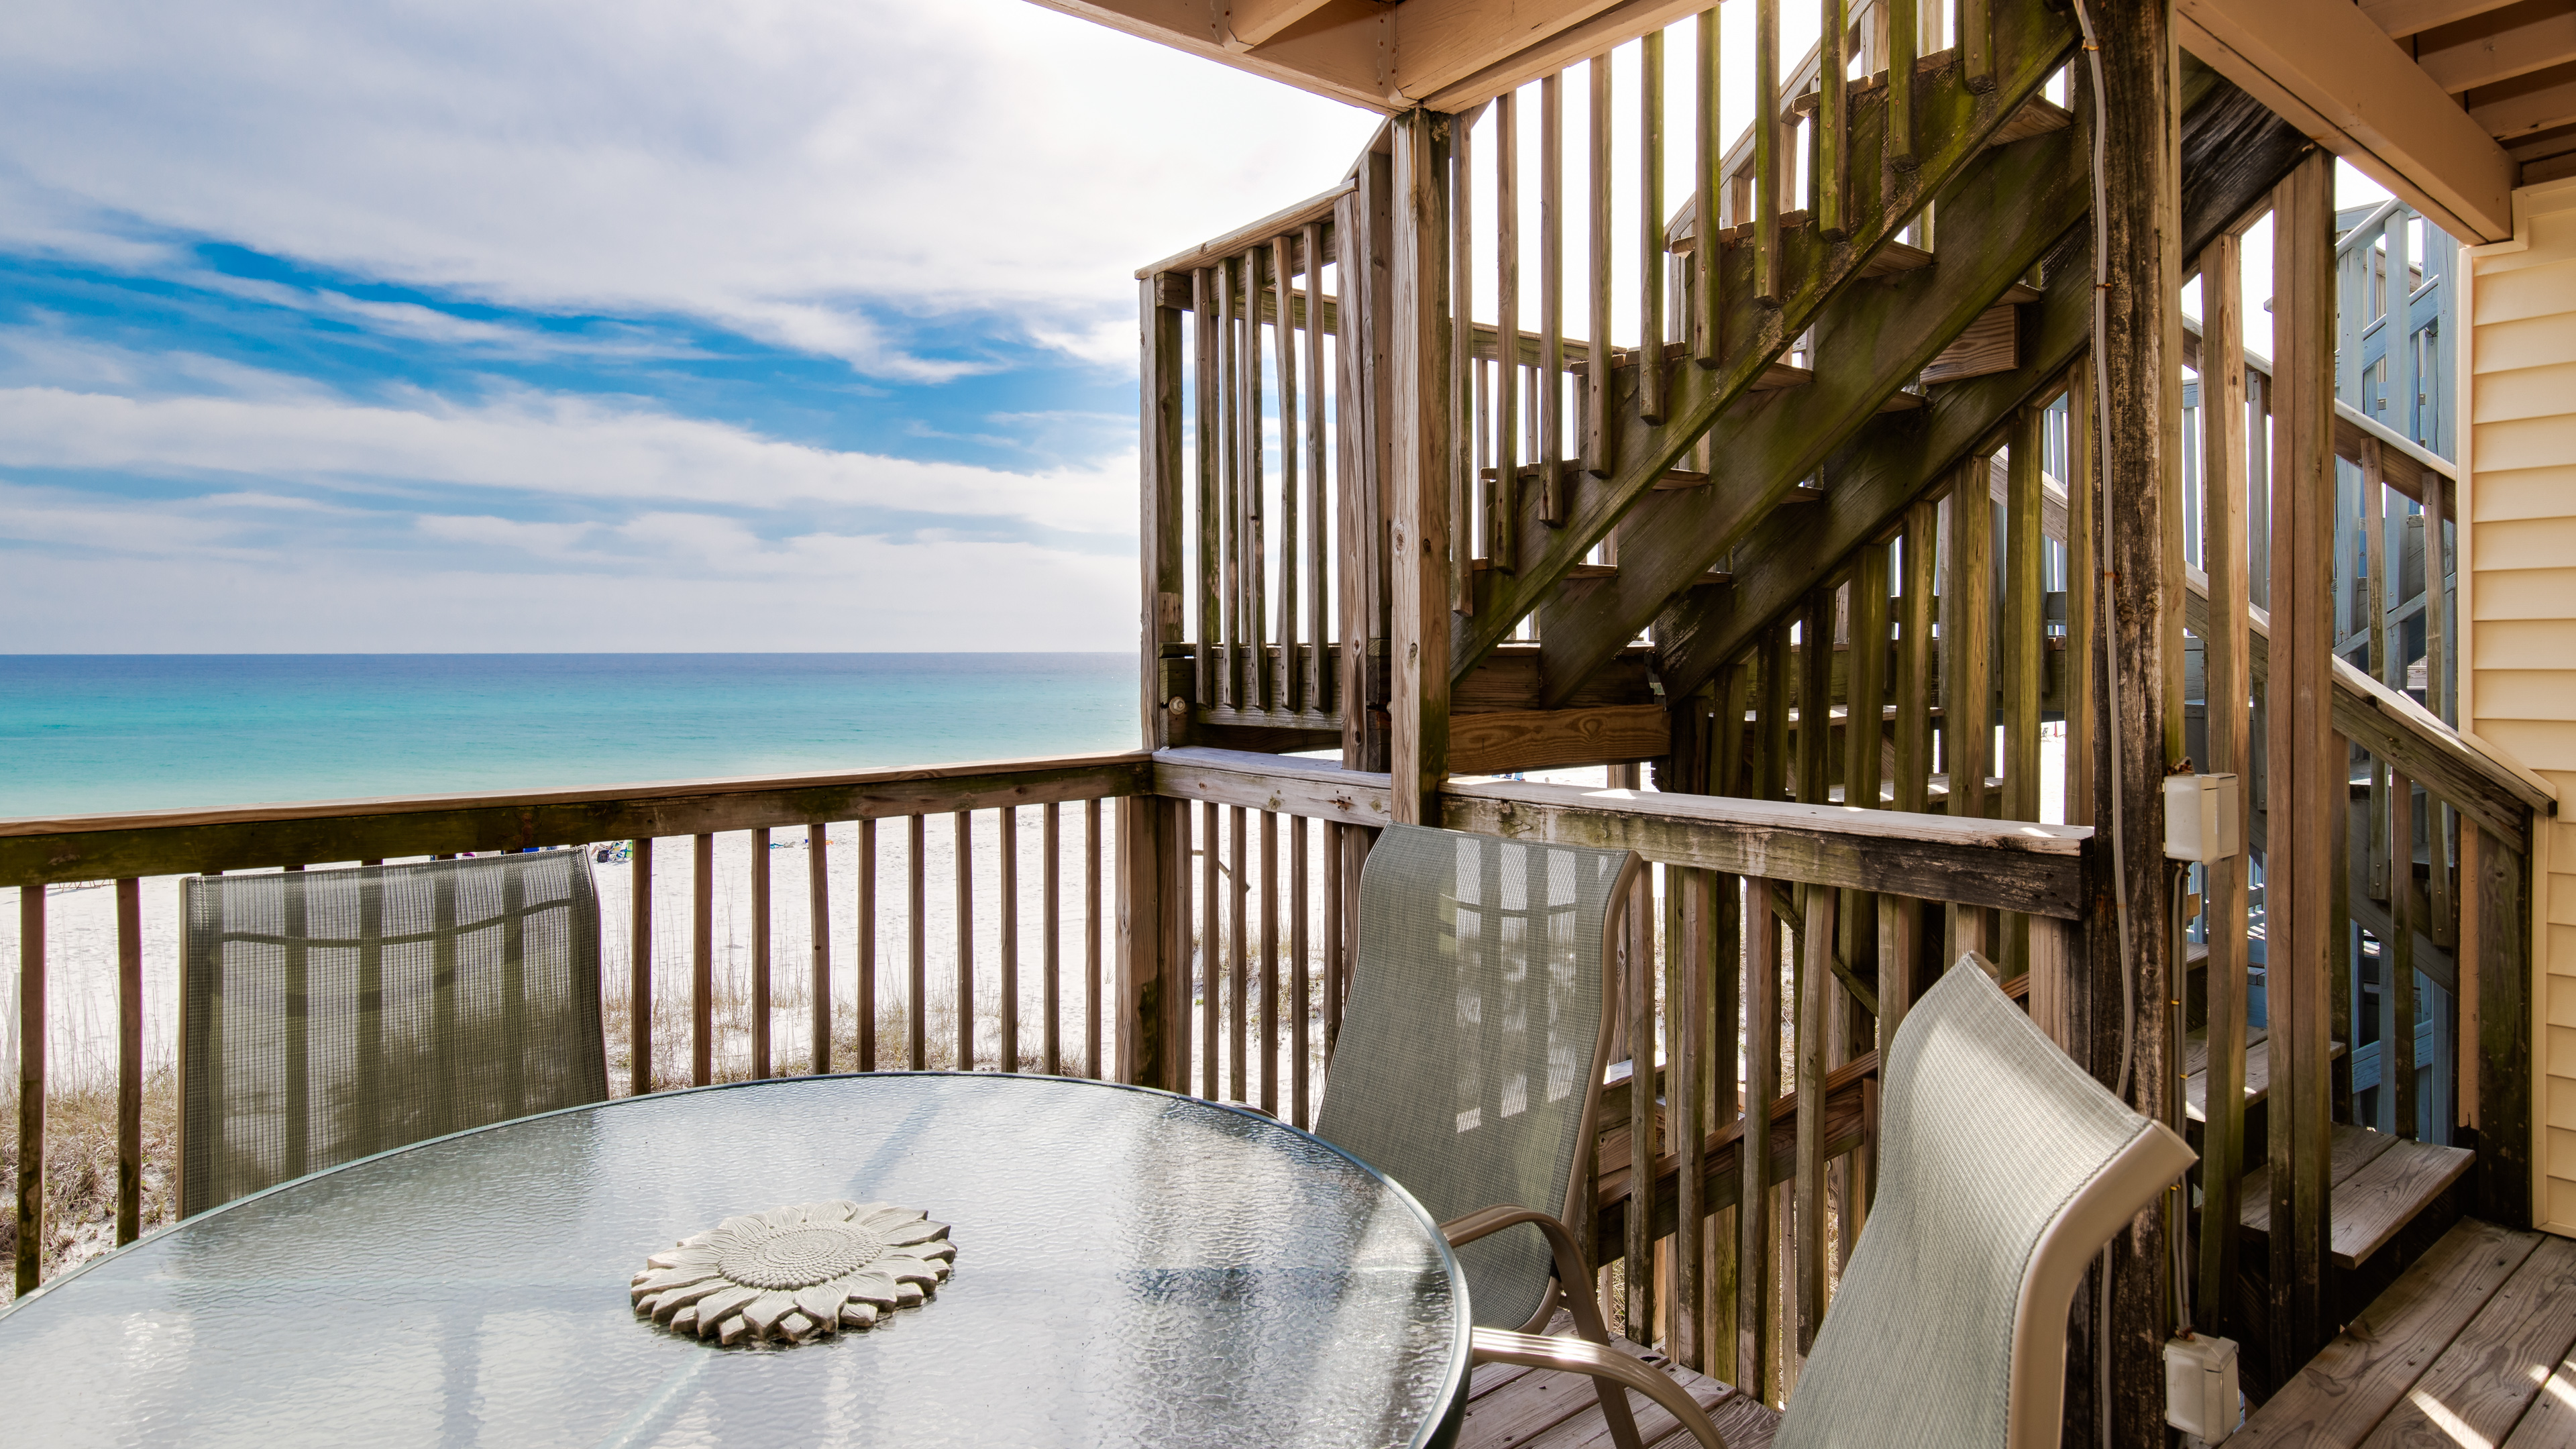 Miramar Beach Vacation Rentals | Cast a Waves | RealJoy